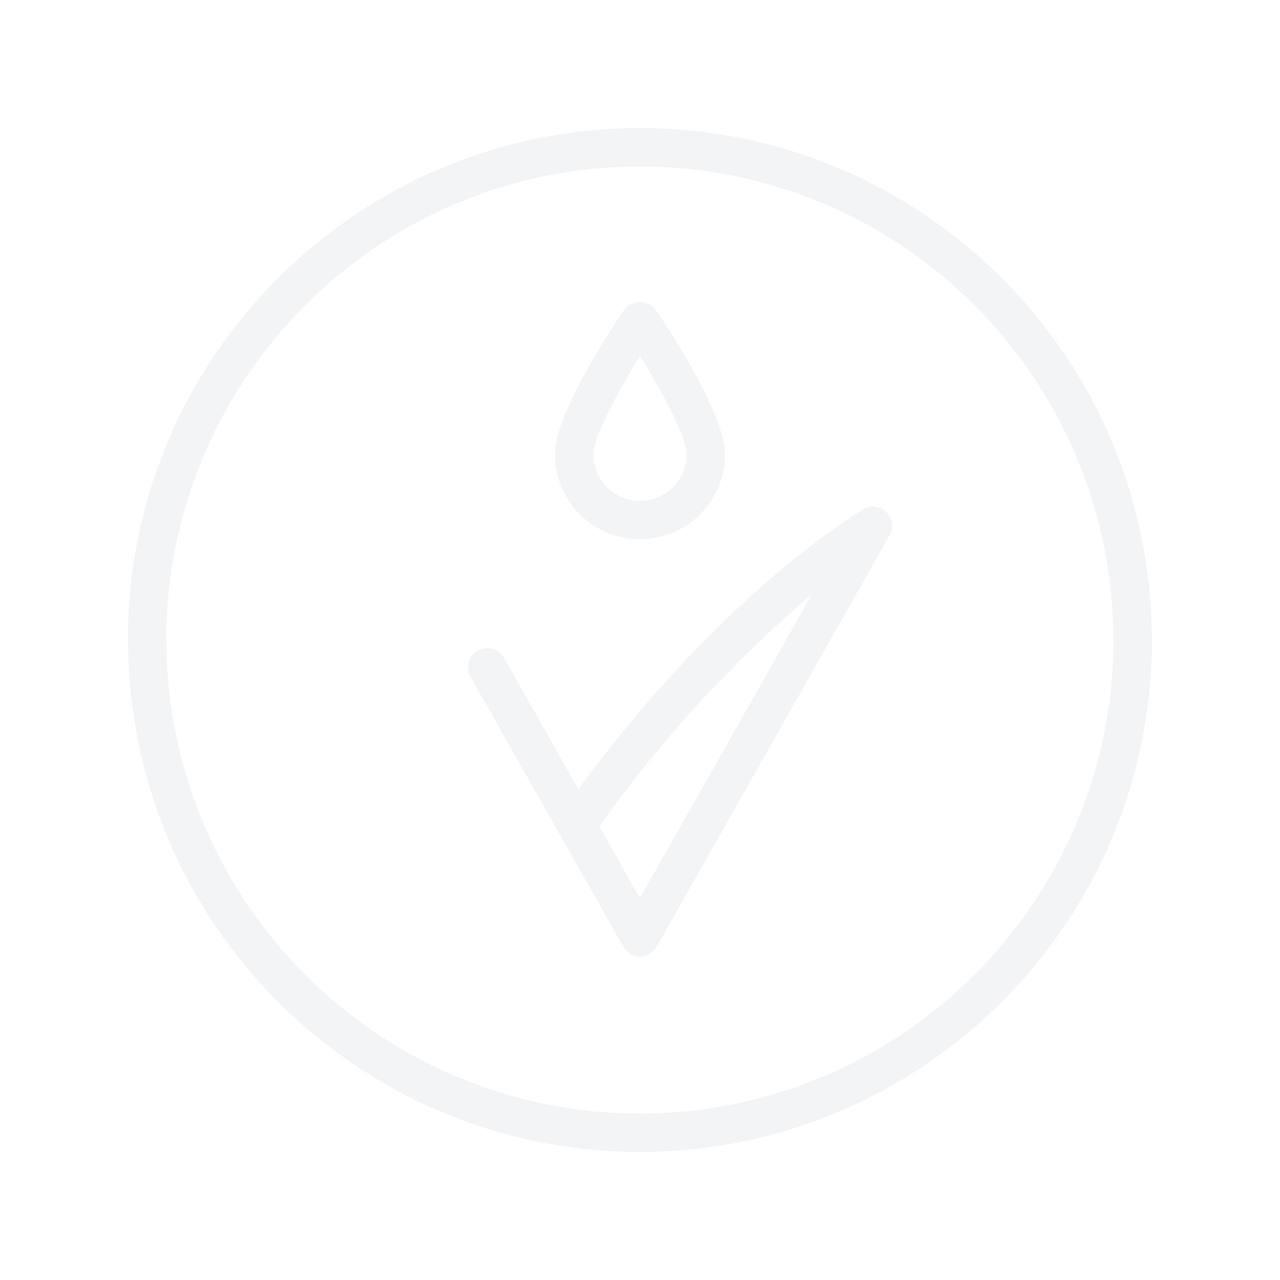 TAHE Botanic Keratin Gold Satin 5 Hair Mousse 300ml